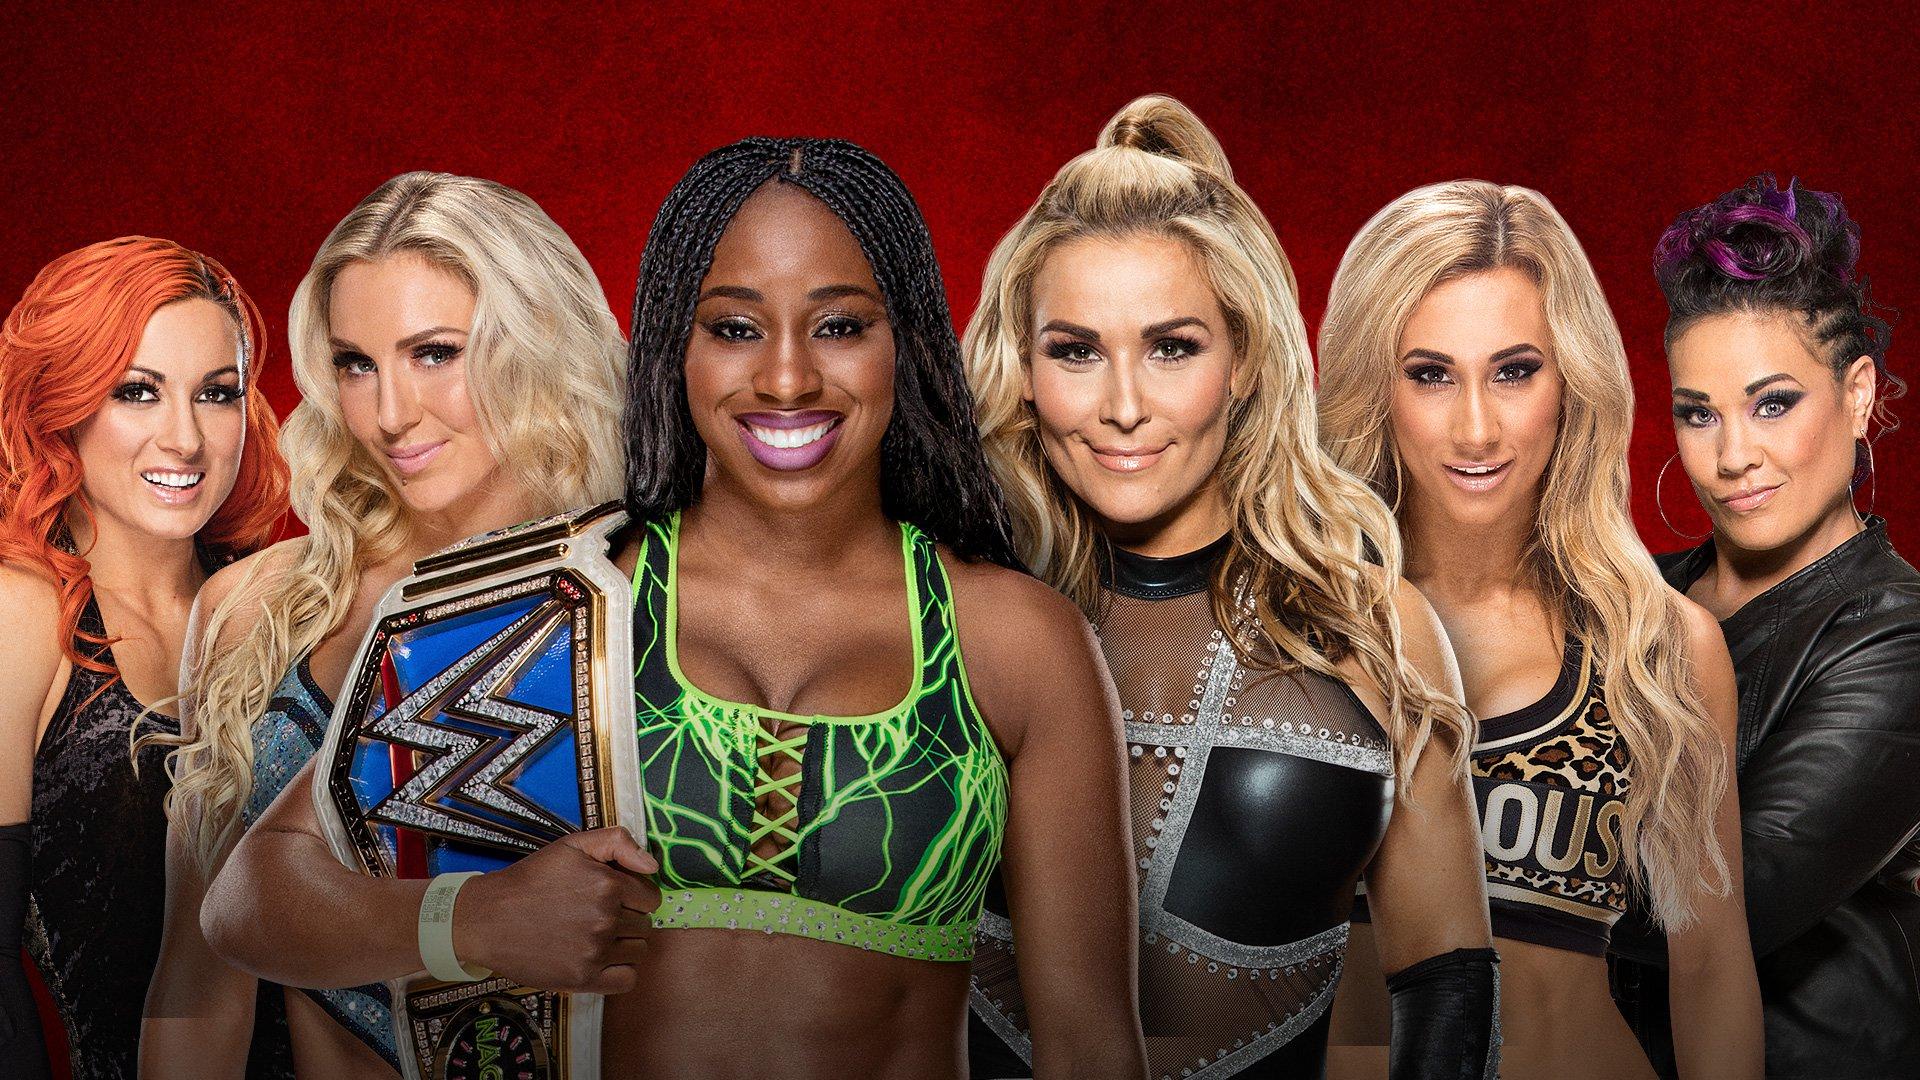 WWE Backlash: Naomi, Charlotte Flair e Becky Lynch vs. Tamina Snuka, Carmella e Natalya